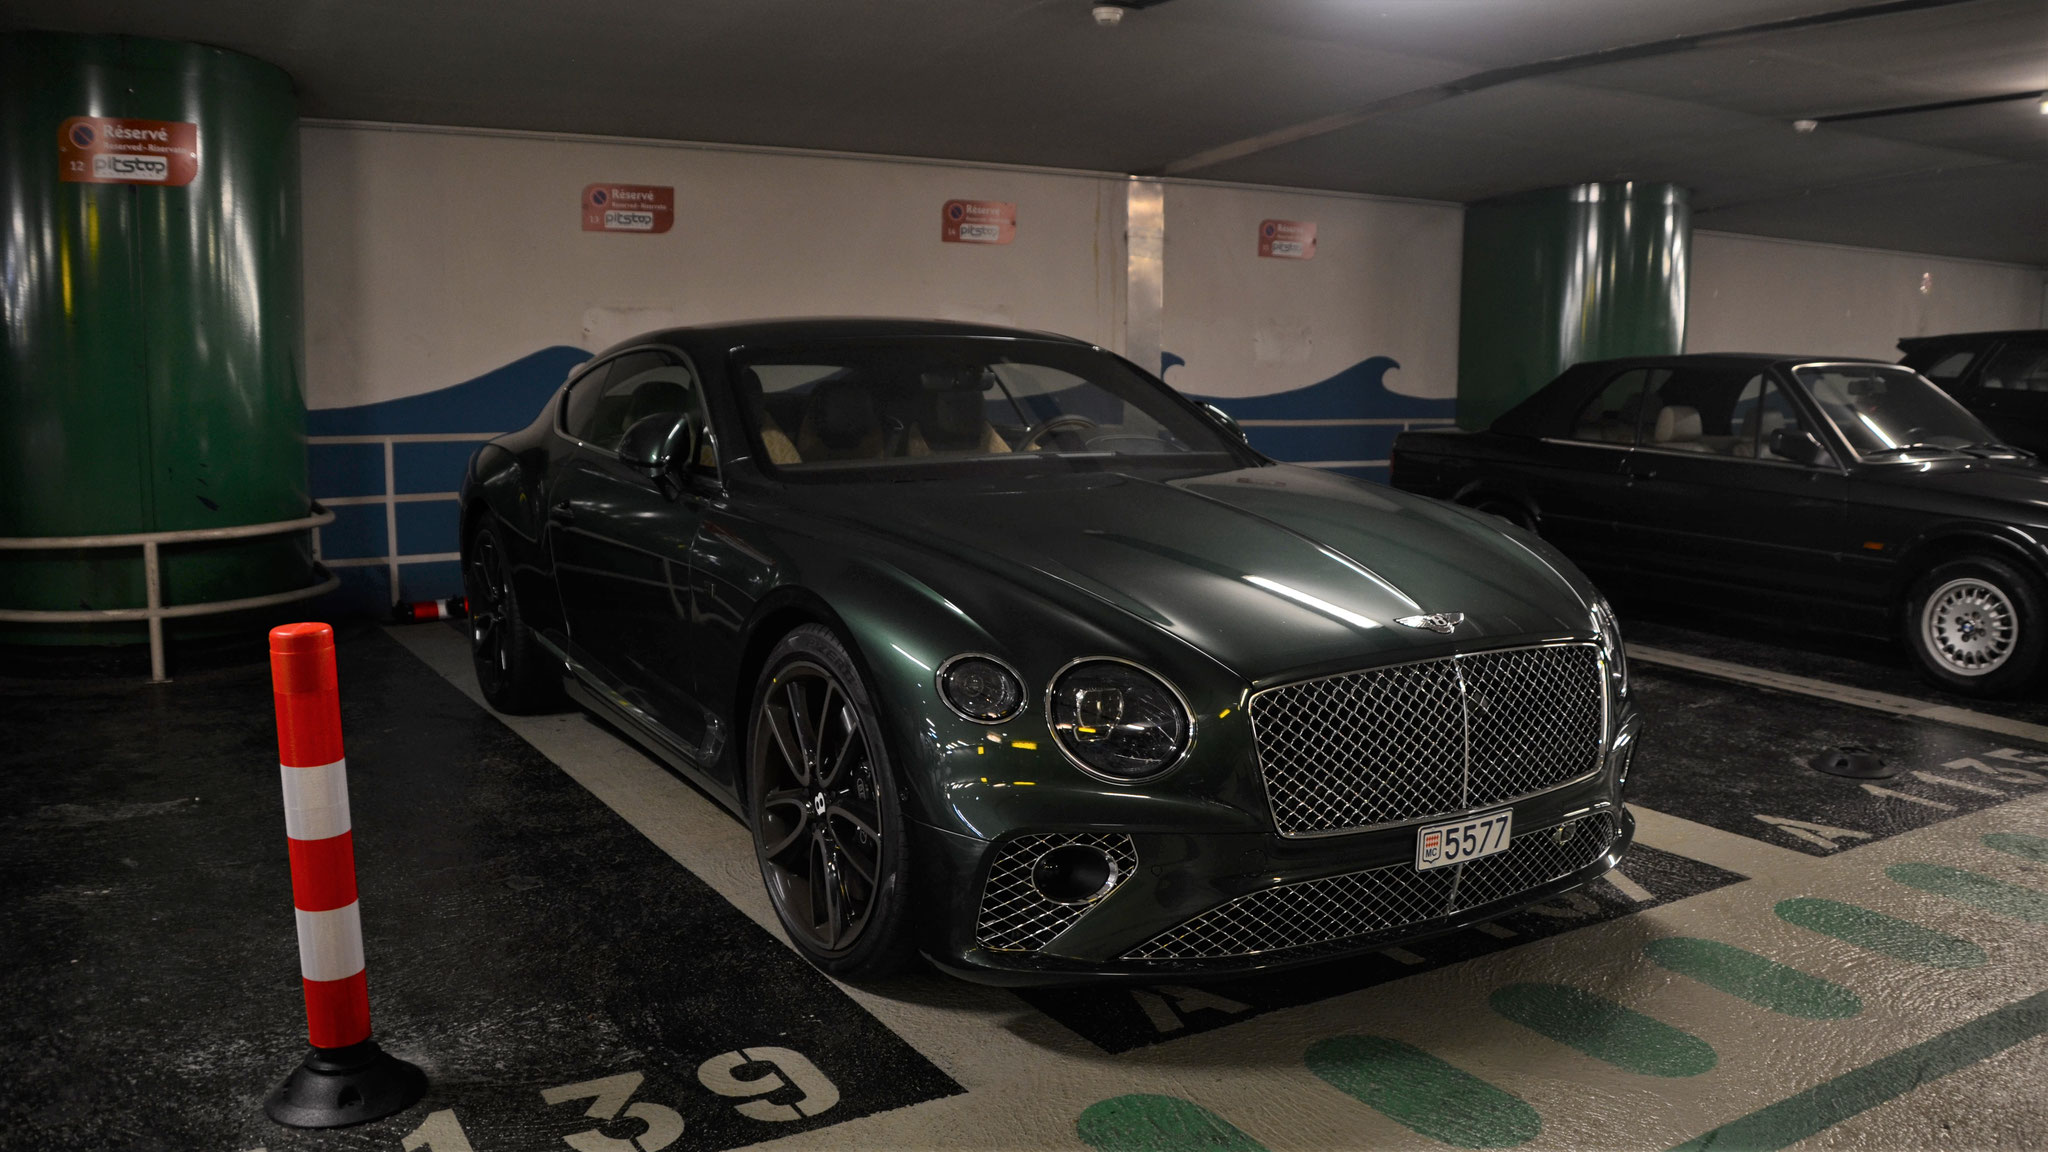 Bentley Continental GT - 5577 (MC)